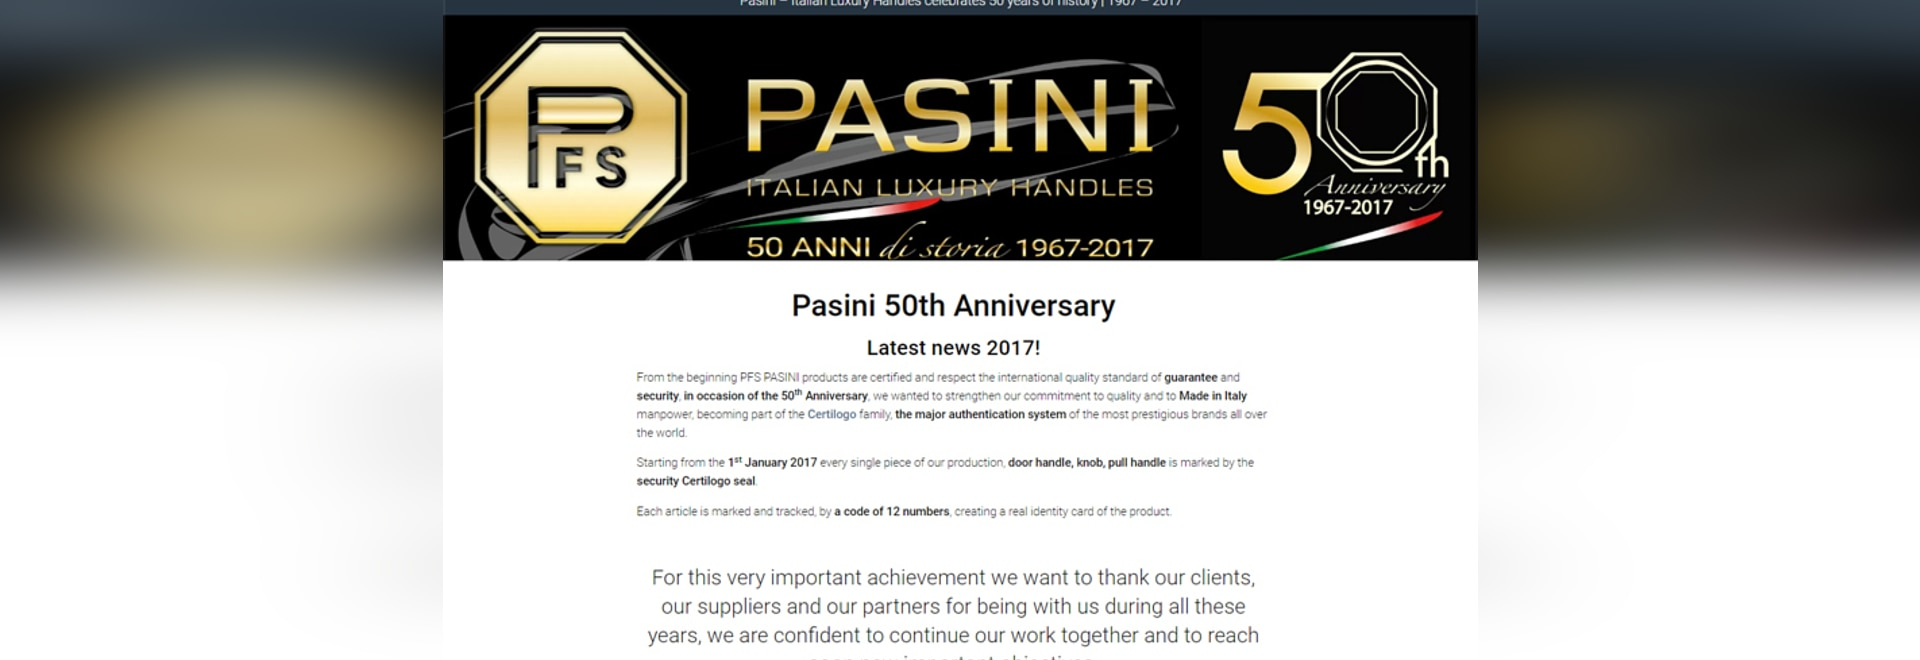 Pasini 50th Anniversary